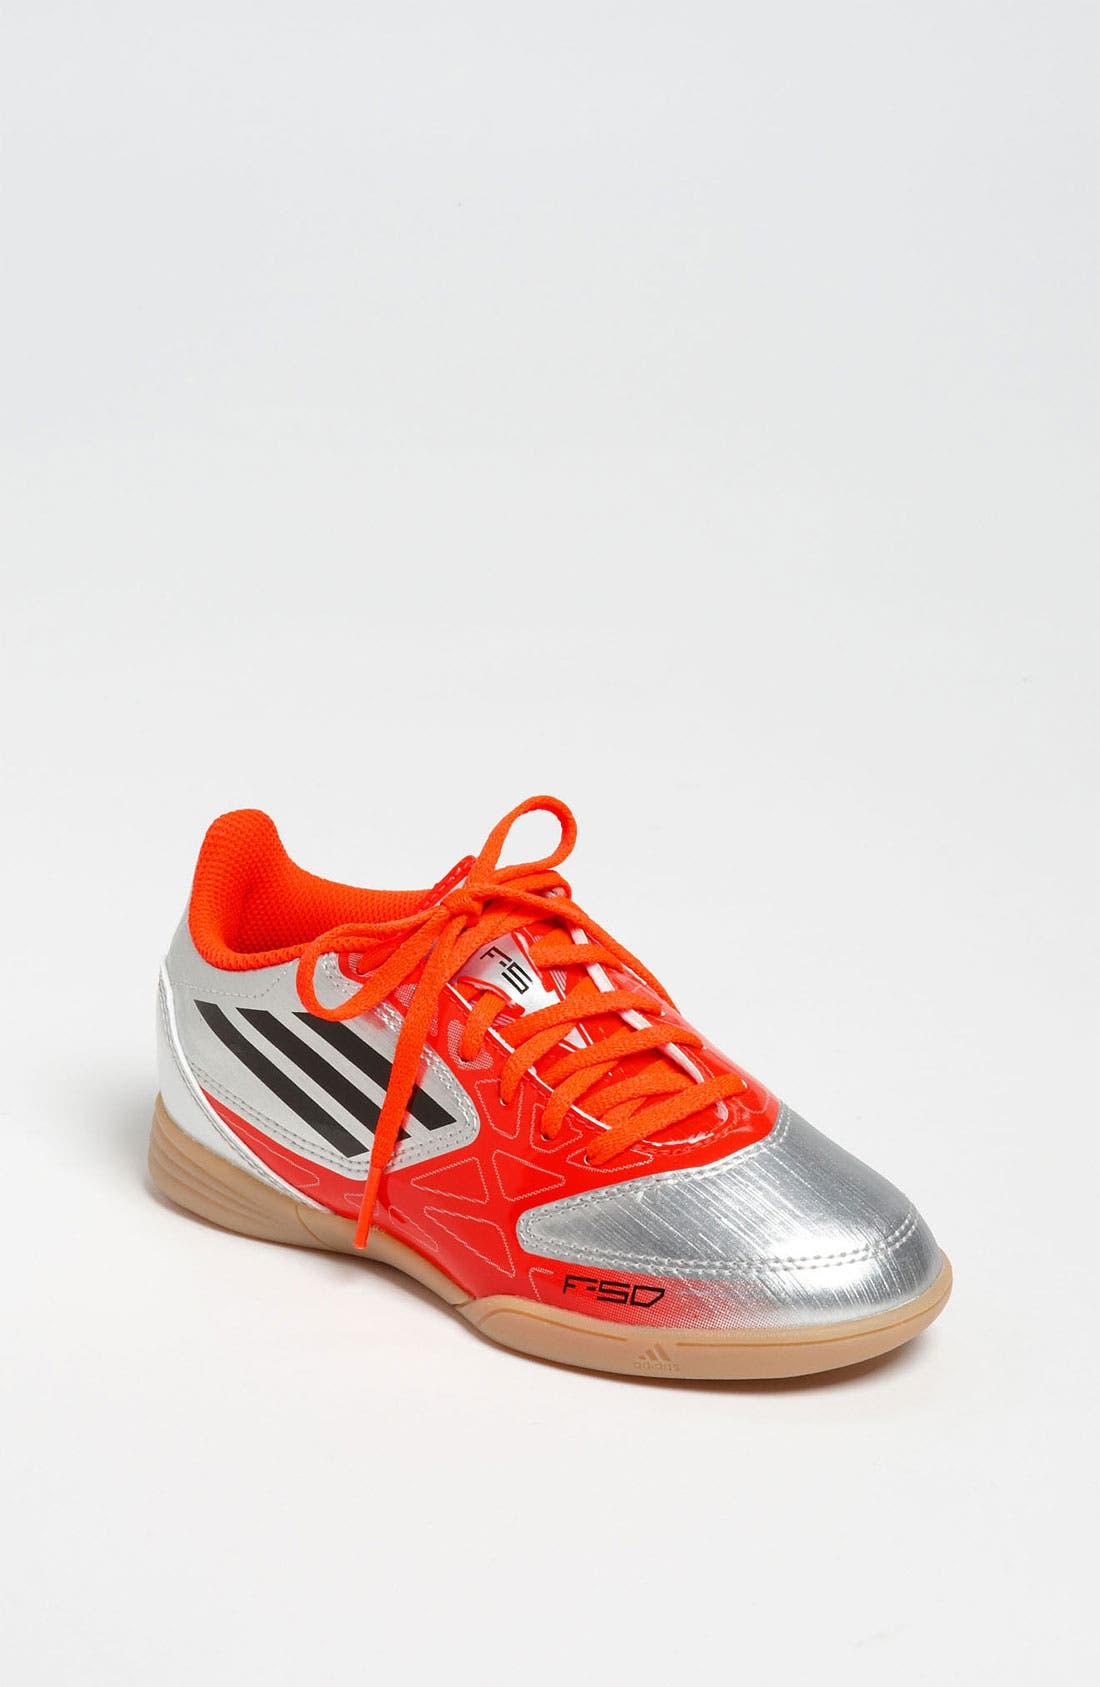 Alternate Image 1 Selected - adidas 'F10' Soccer Sneaker (Toddler, Little Kid & Big Kid)